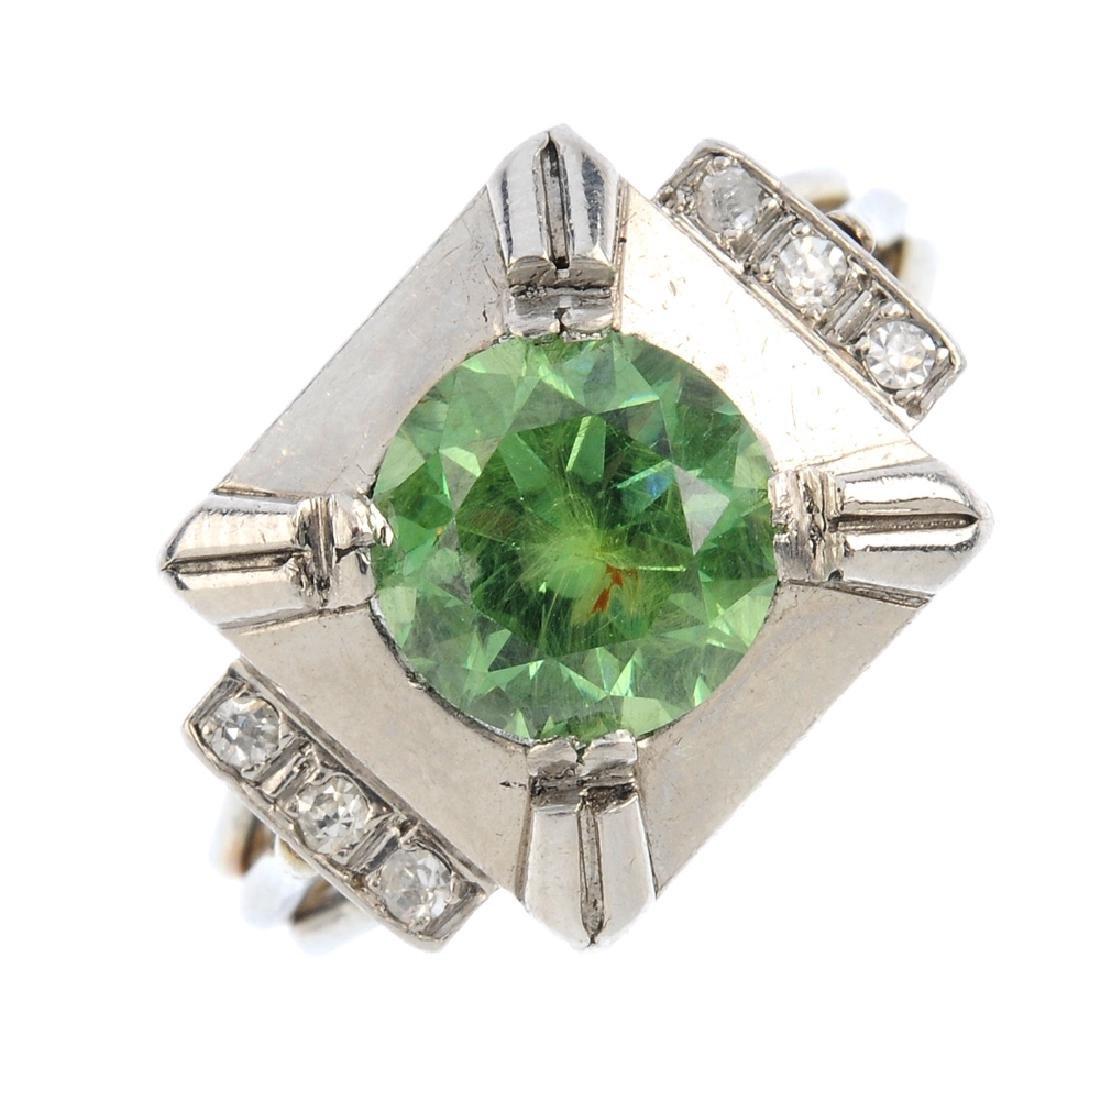 A demantoid garnet and diamond dress ring. The